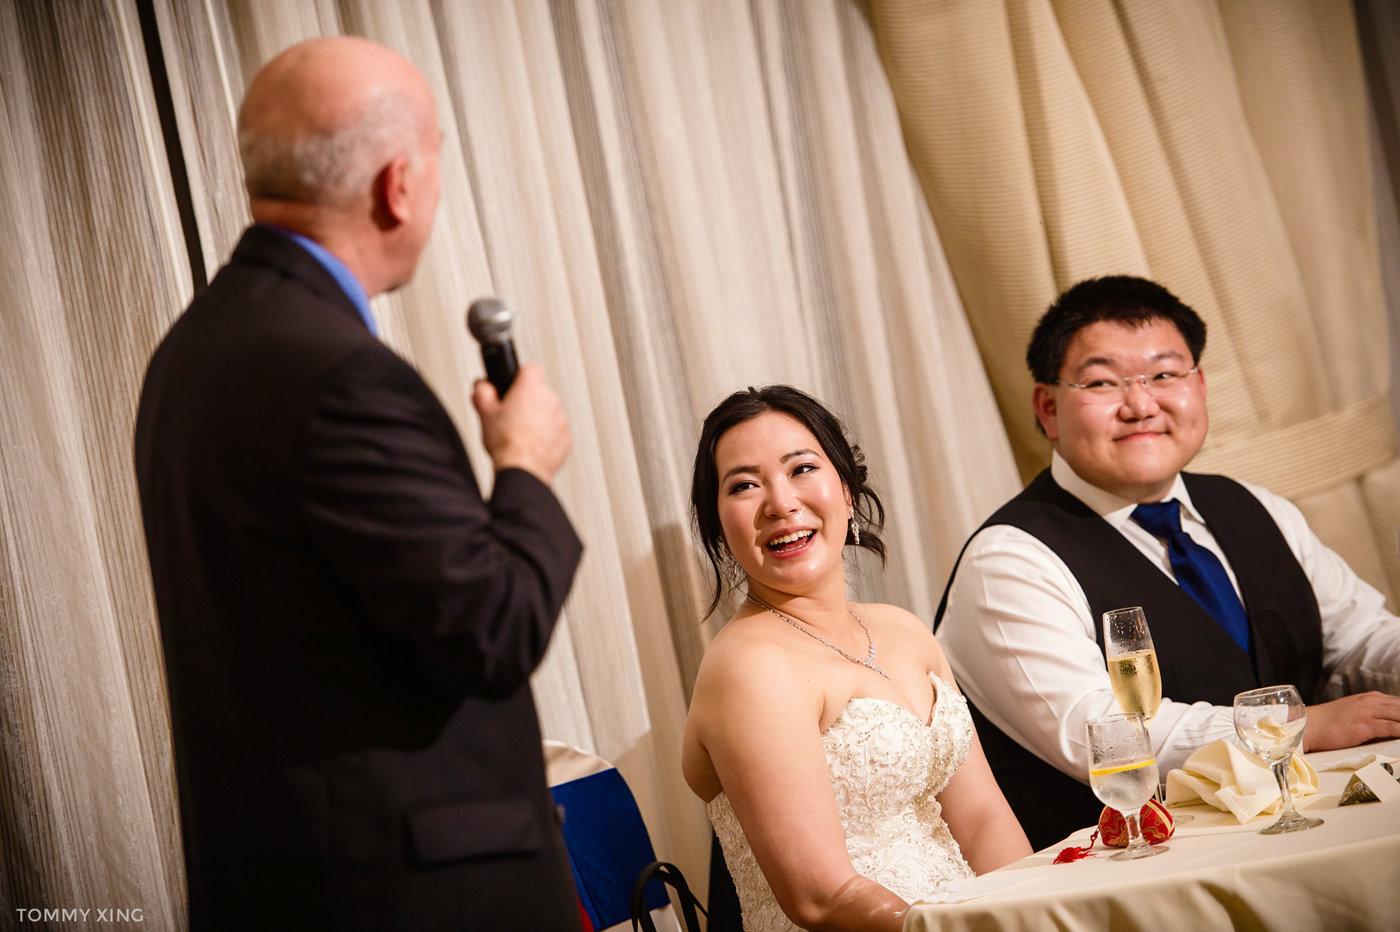 STANFORD MEMORIAL CHURCH WEDDING - Wenjie & Chengcheng - SAN FRANCISCO BAY AREA 斯坦福教堂婚礼跟拍 - 洛杉矶婚礼婚纱照摄影师 Tommy Xing Photography221.jpg